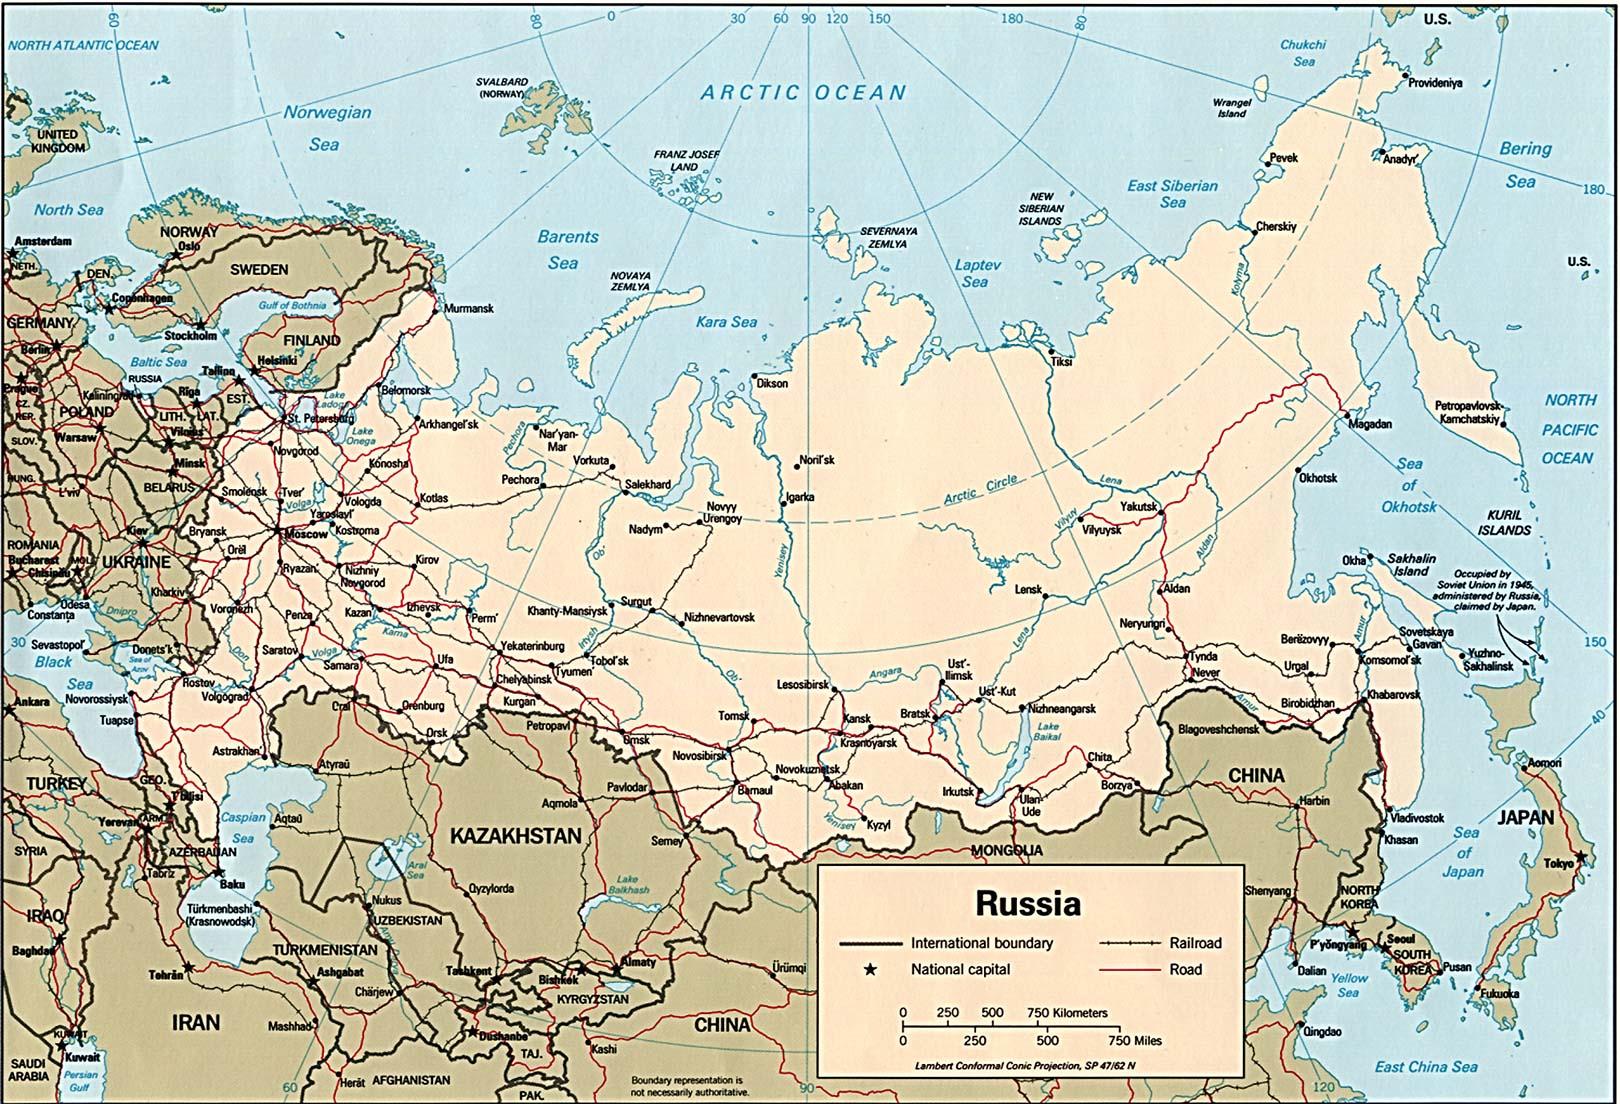 Karte Russland.Landkarte Russland Politische Karte Weltkarte Com